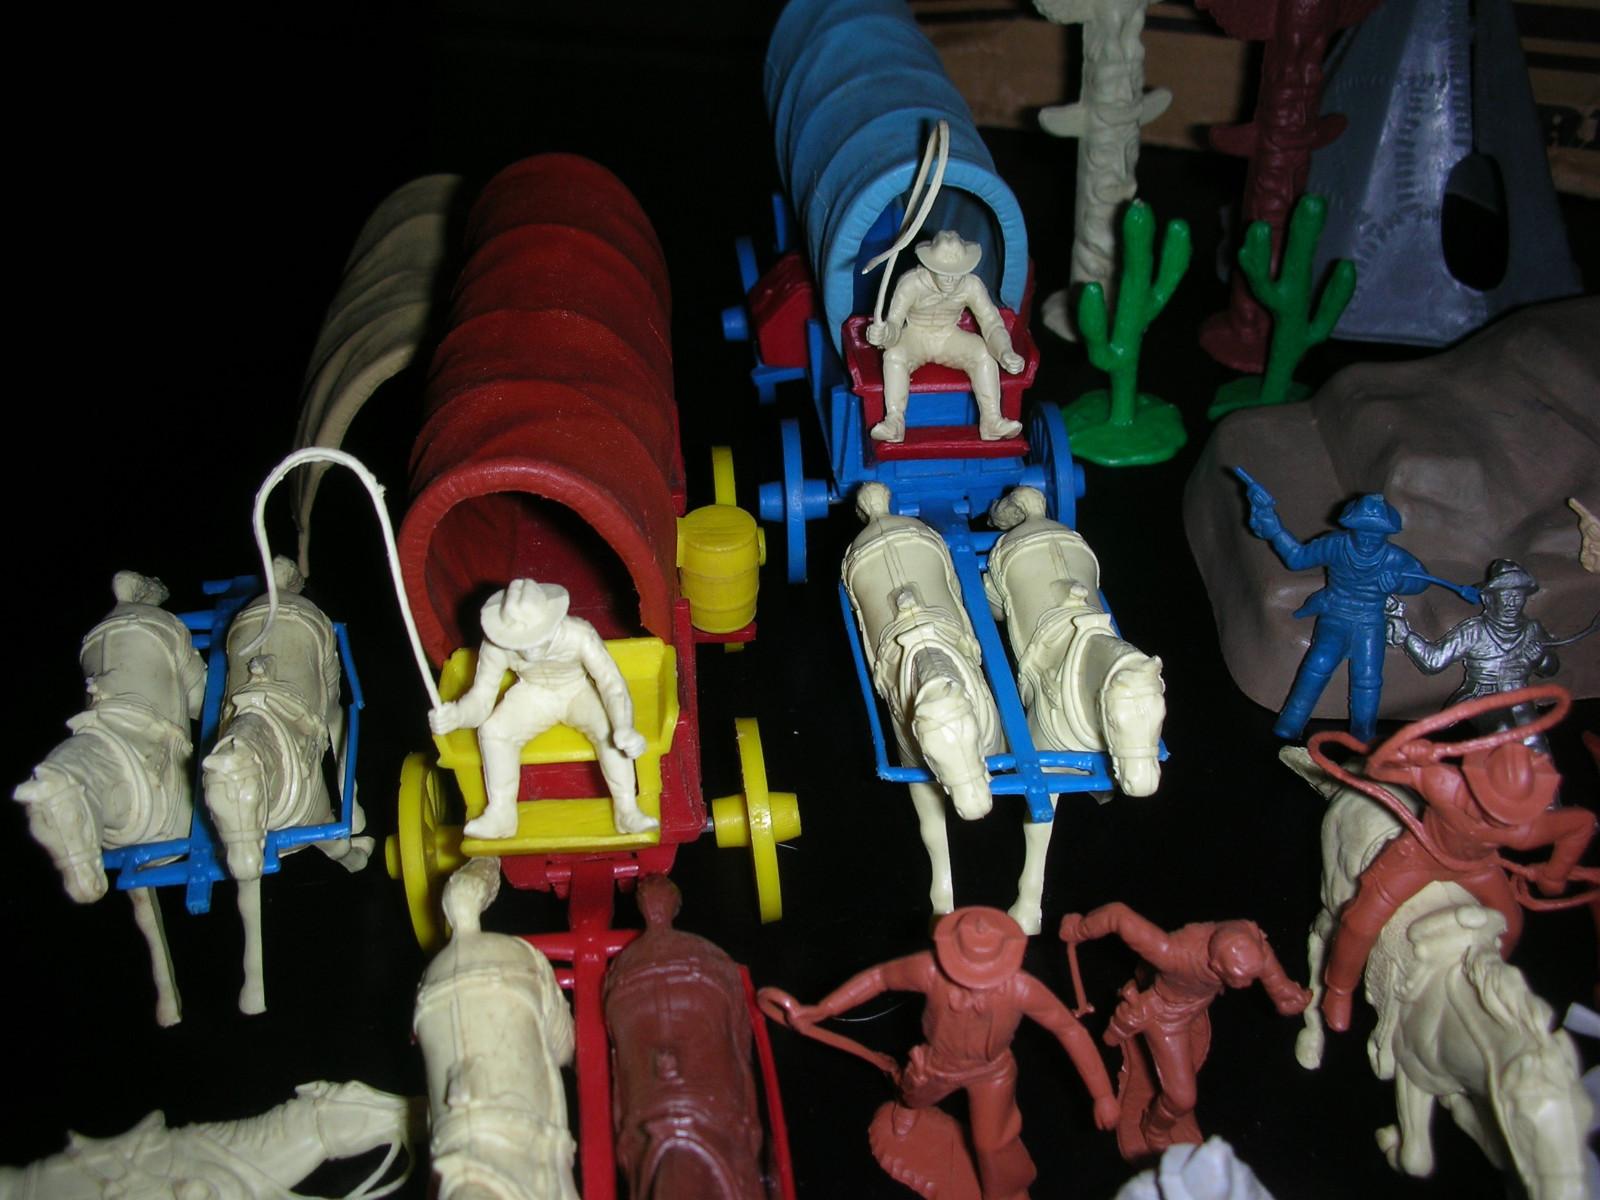 Marx toys wagon train play set